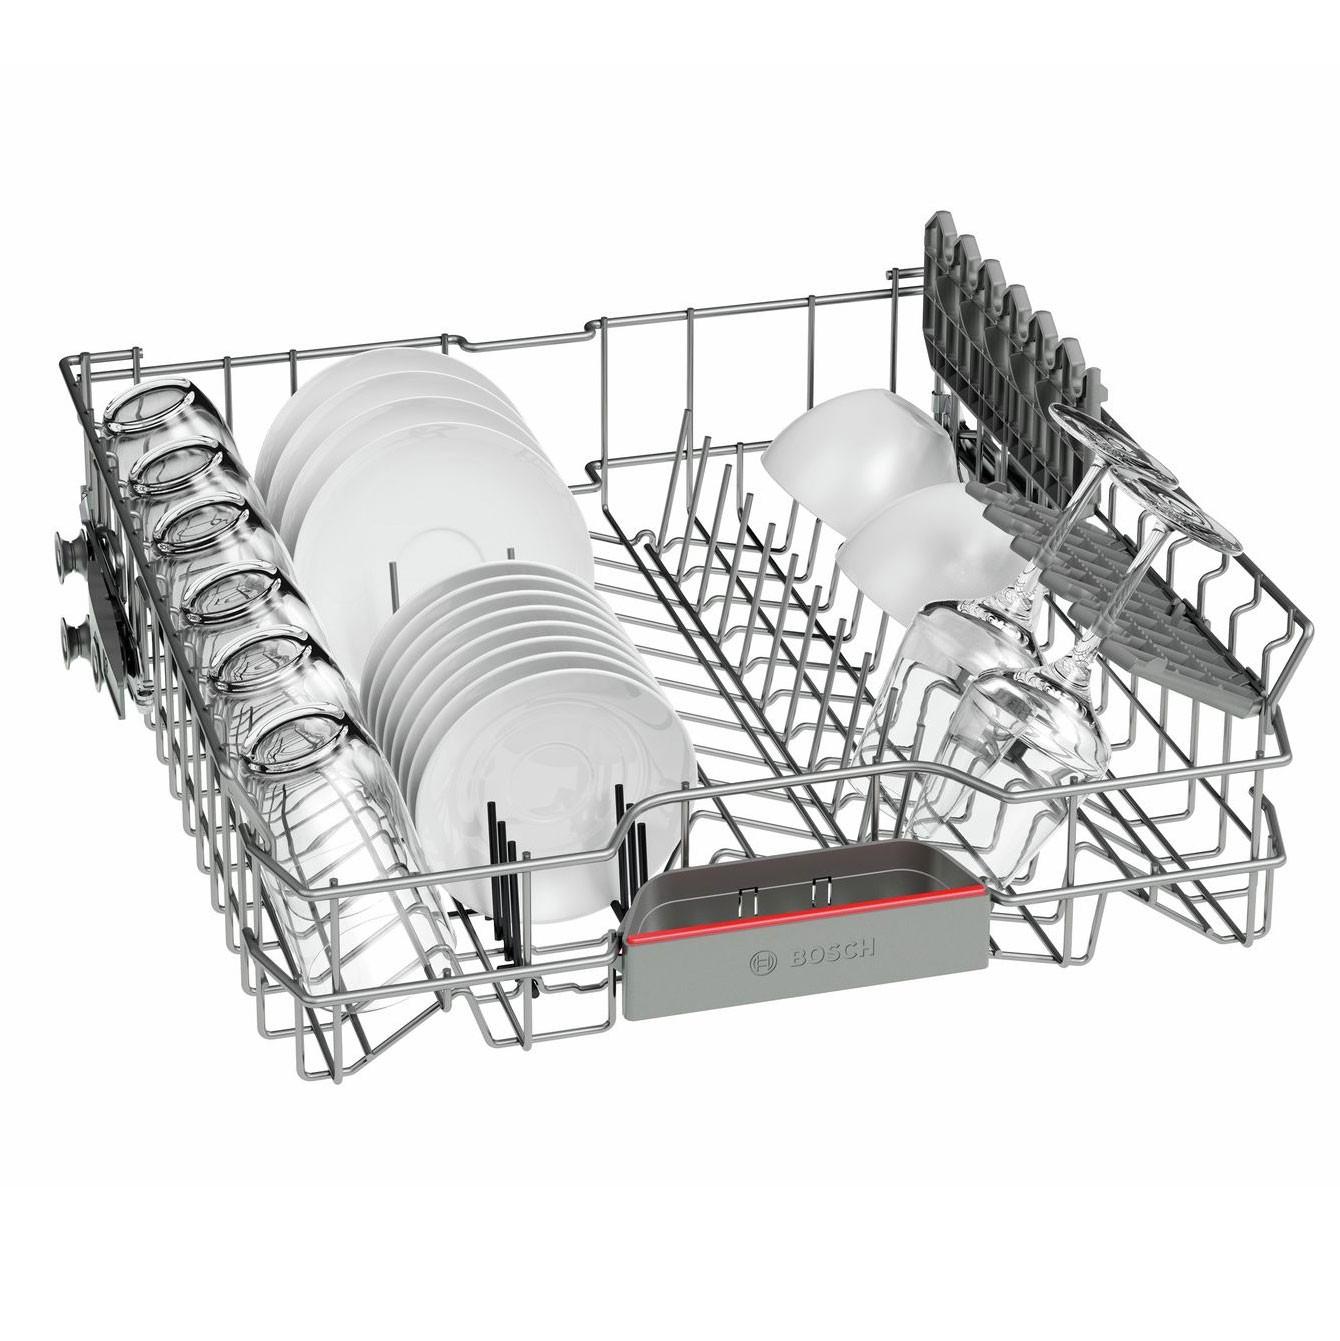 Masina de spalat vase incorporabila Bosch SMV46GX01E, 12 seturi, 6 programe, clasa A++, latime 60 cm, alb